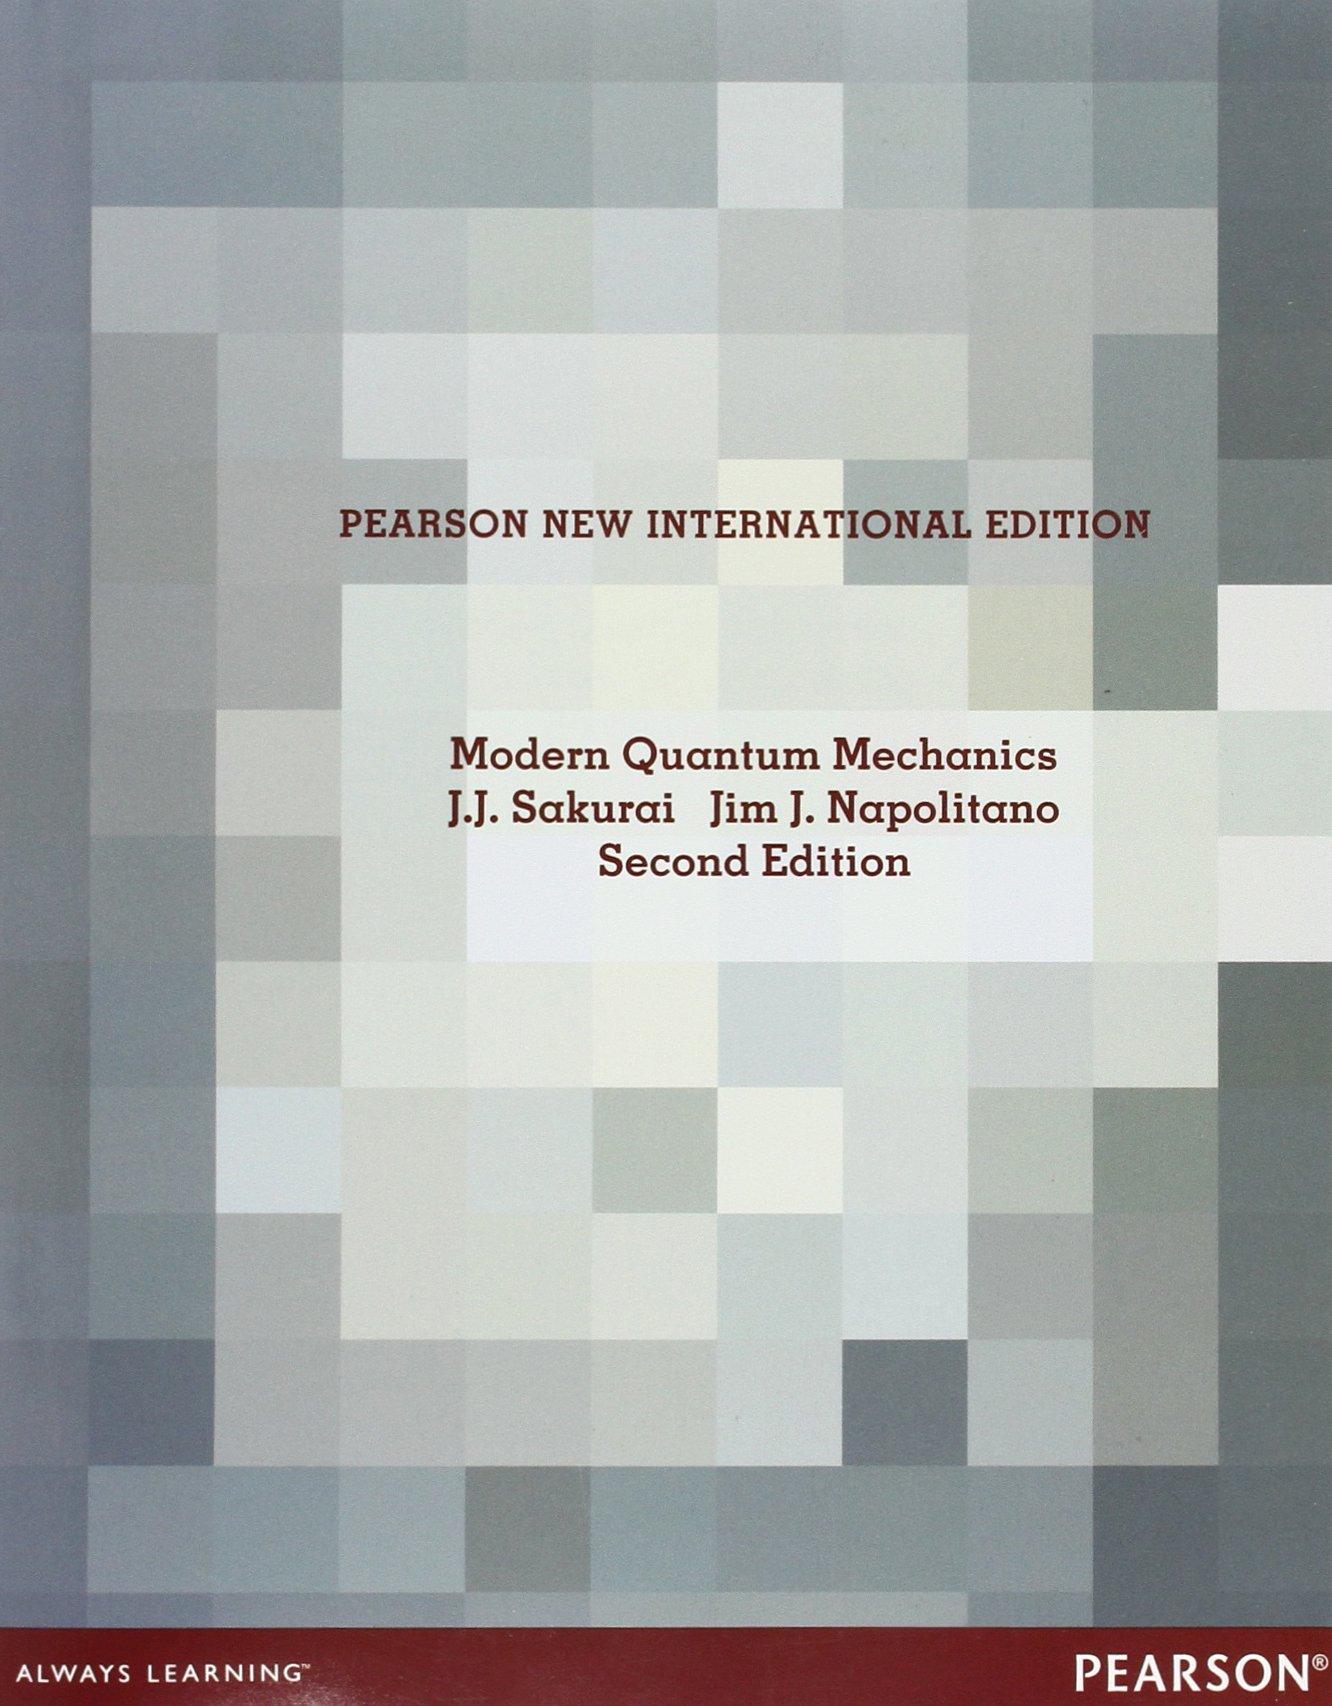 Modern Quantum Mechanics: Pearson New International Edition: Amazon ...